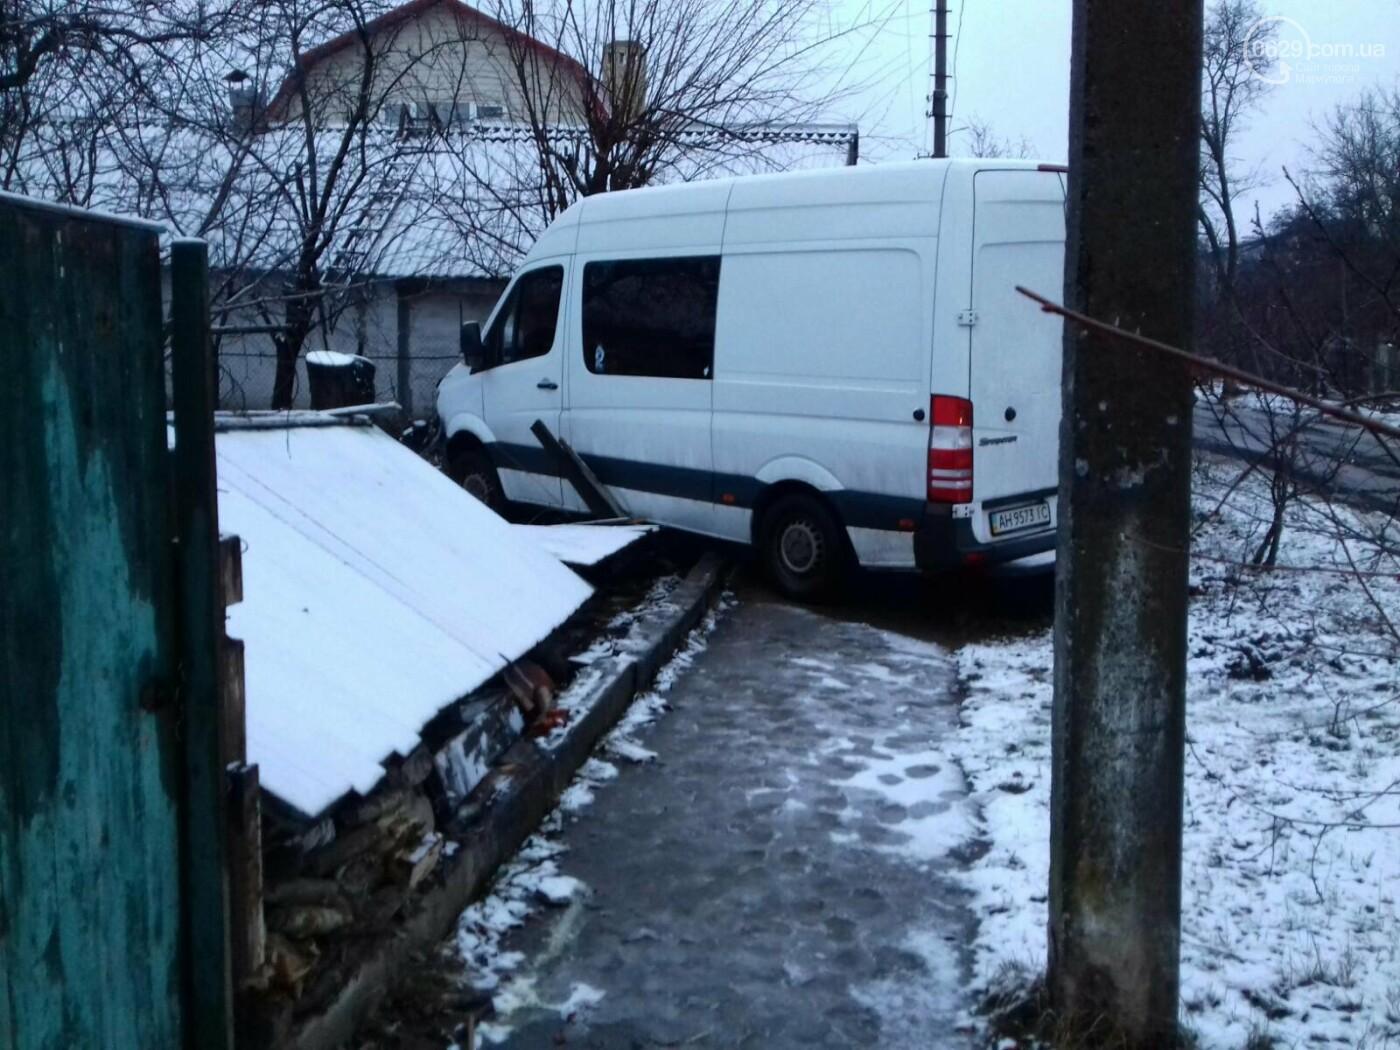 На Левобережье Мариуполя микроавтобус врезался в забор жилого дома, - ФОТО, фото-1